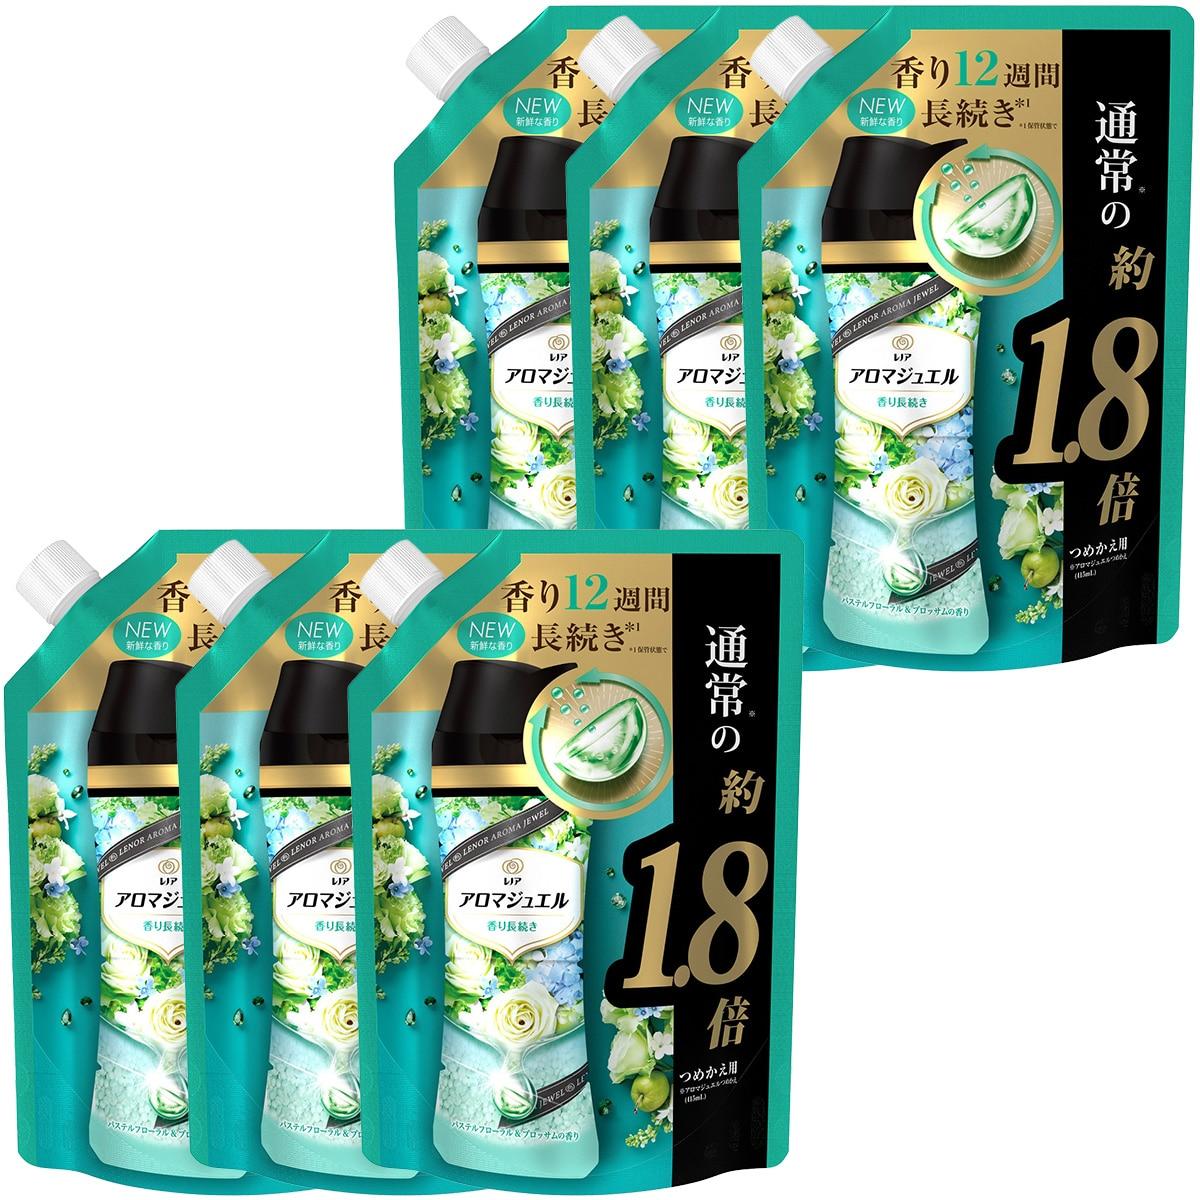 P&G レノア ハピネス アロマジュエル 香りづけ専用ビーズ ヘビロテ服も新鮮な香り長続き パステルフローラル&ブロッサム 詰め替え 約1.8倍(730mL)×6袋